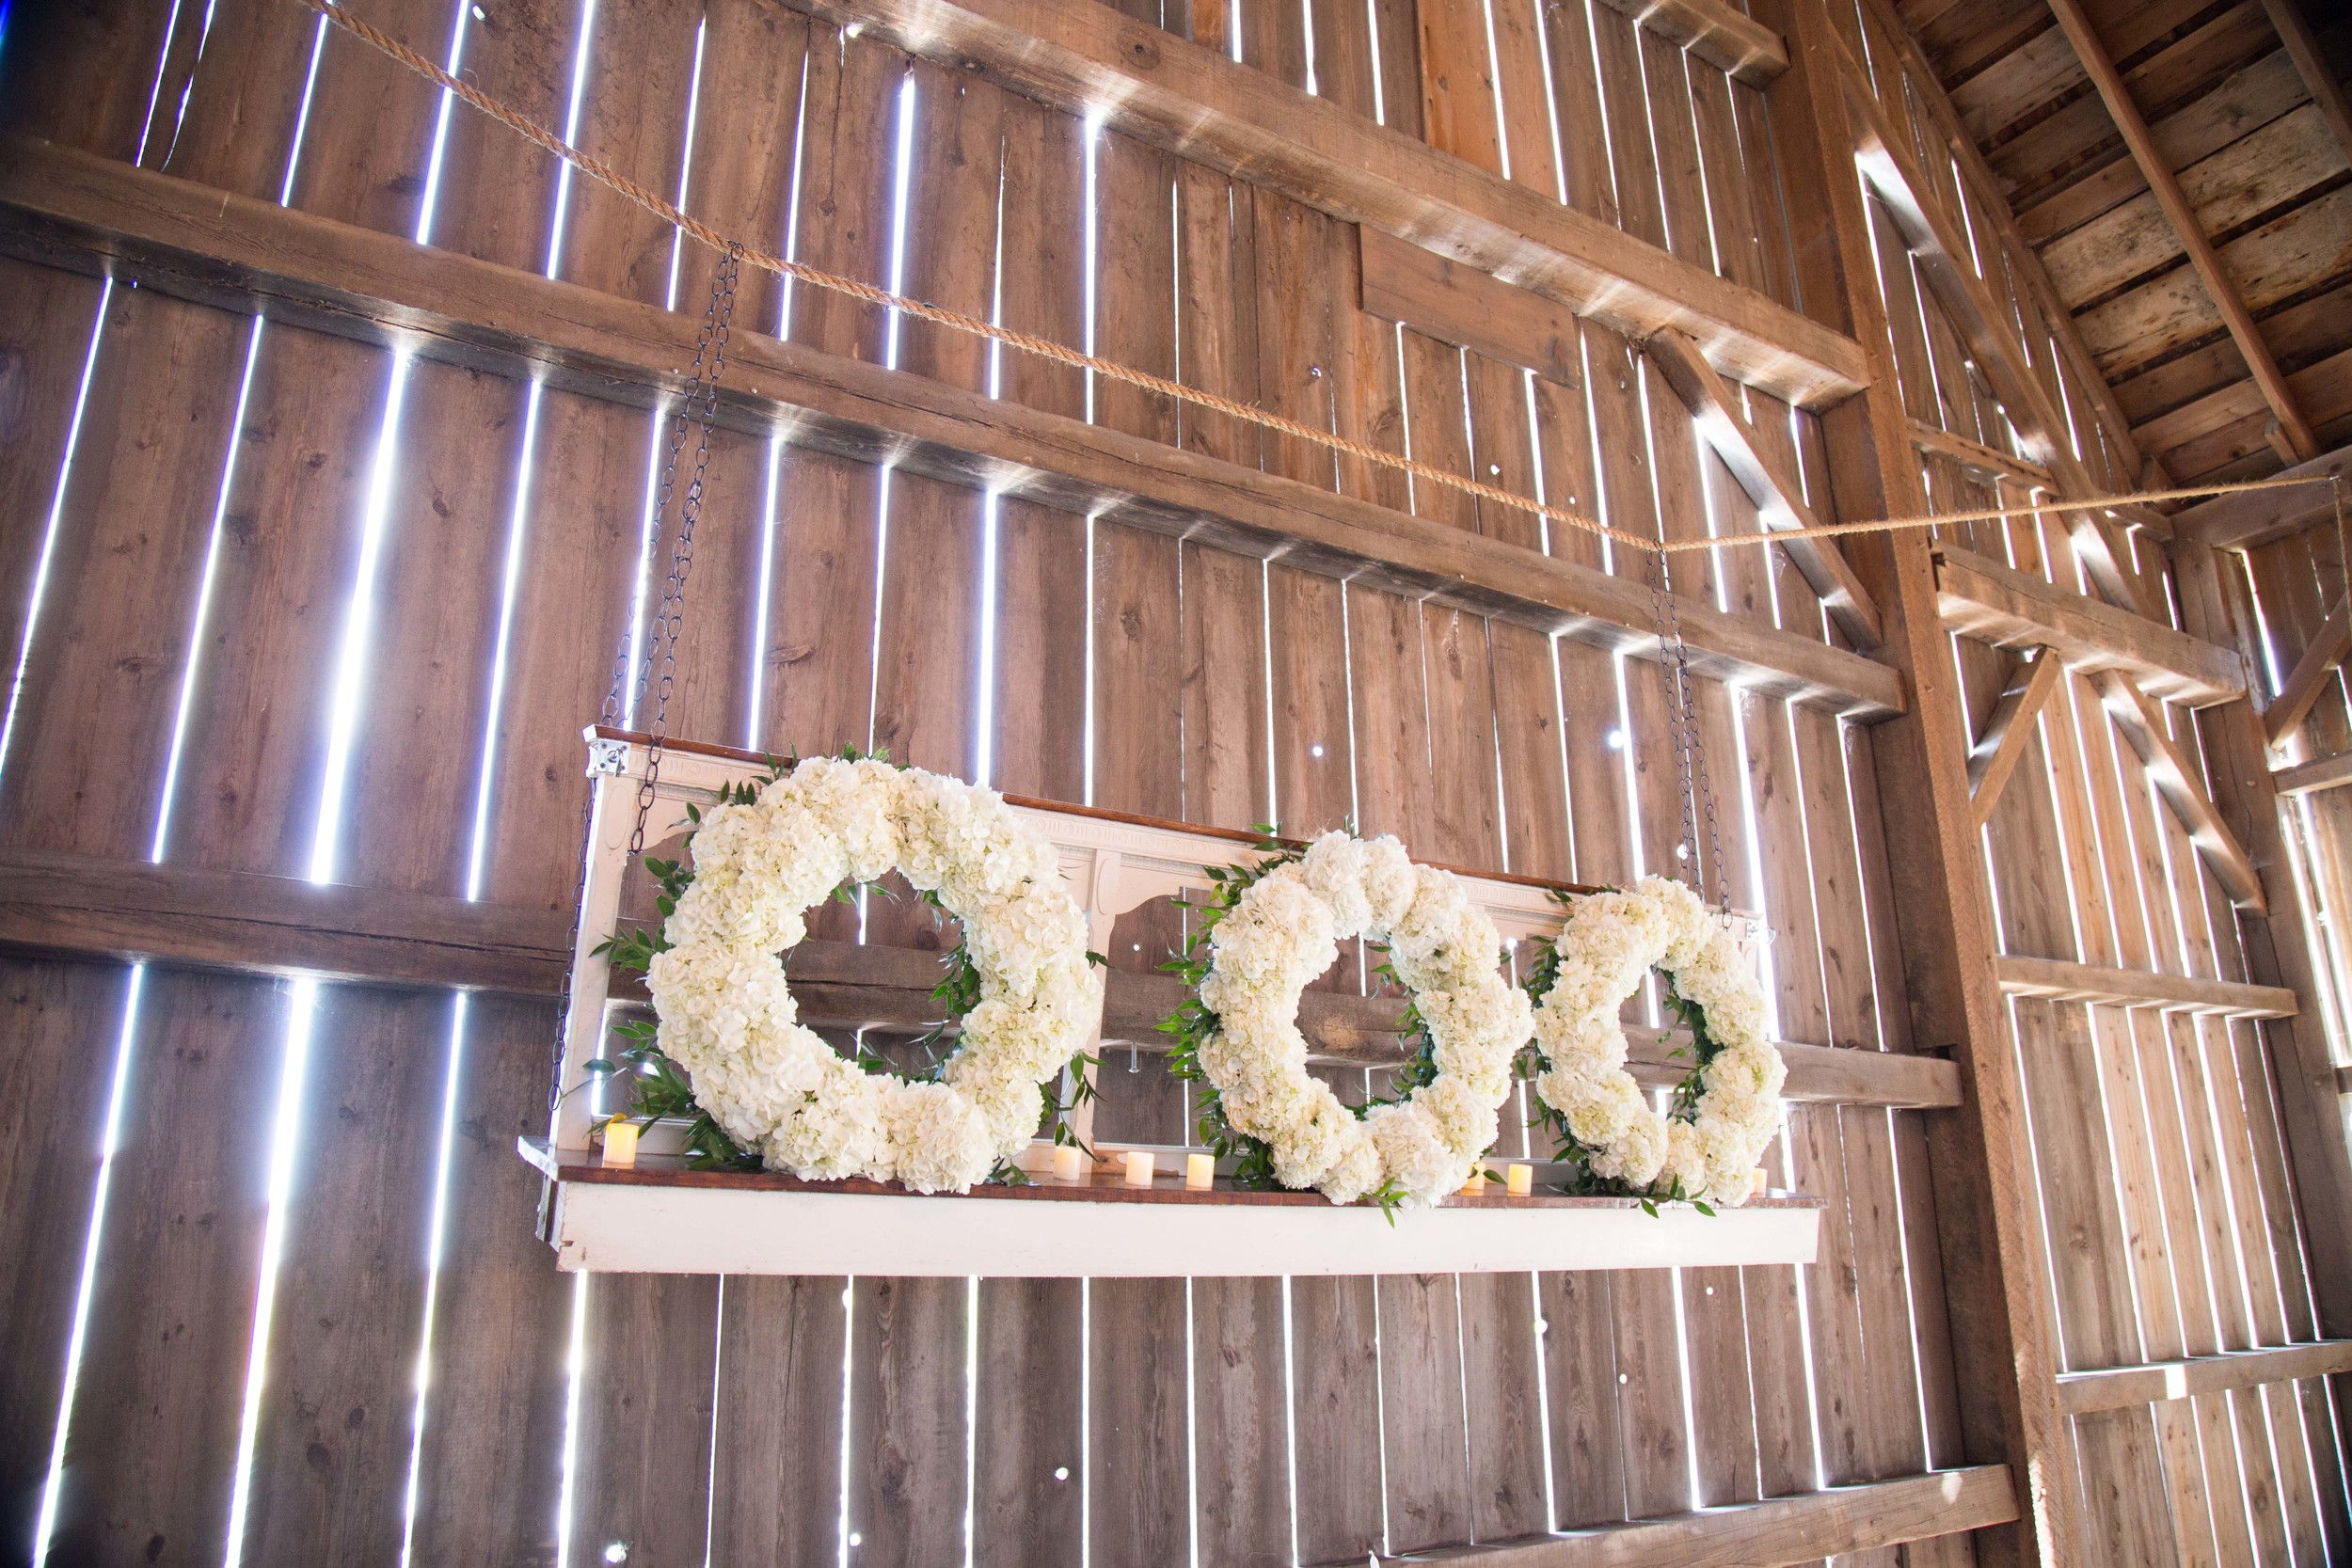 10_2-Barn_Altar_Hanging_Pew_8693.jpg